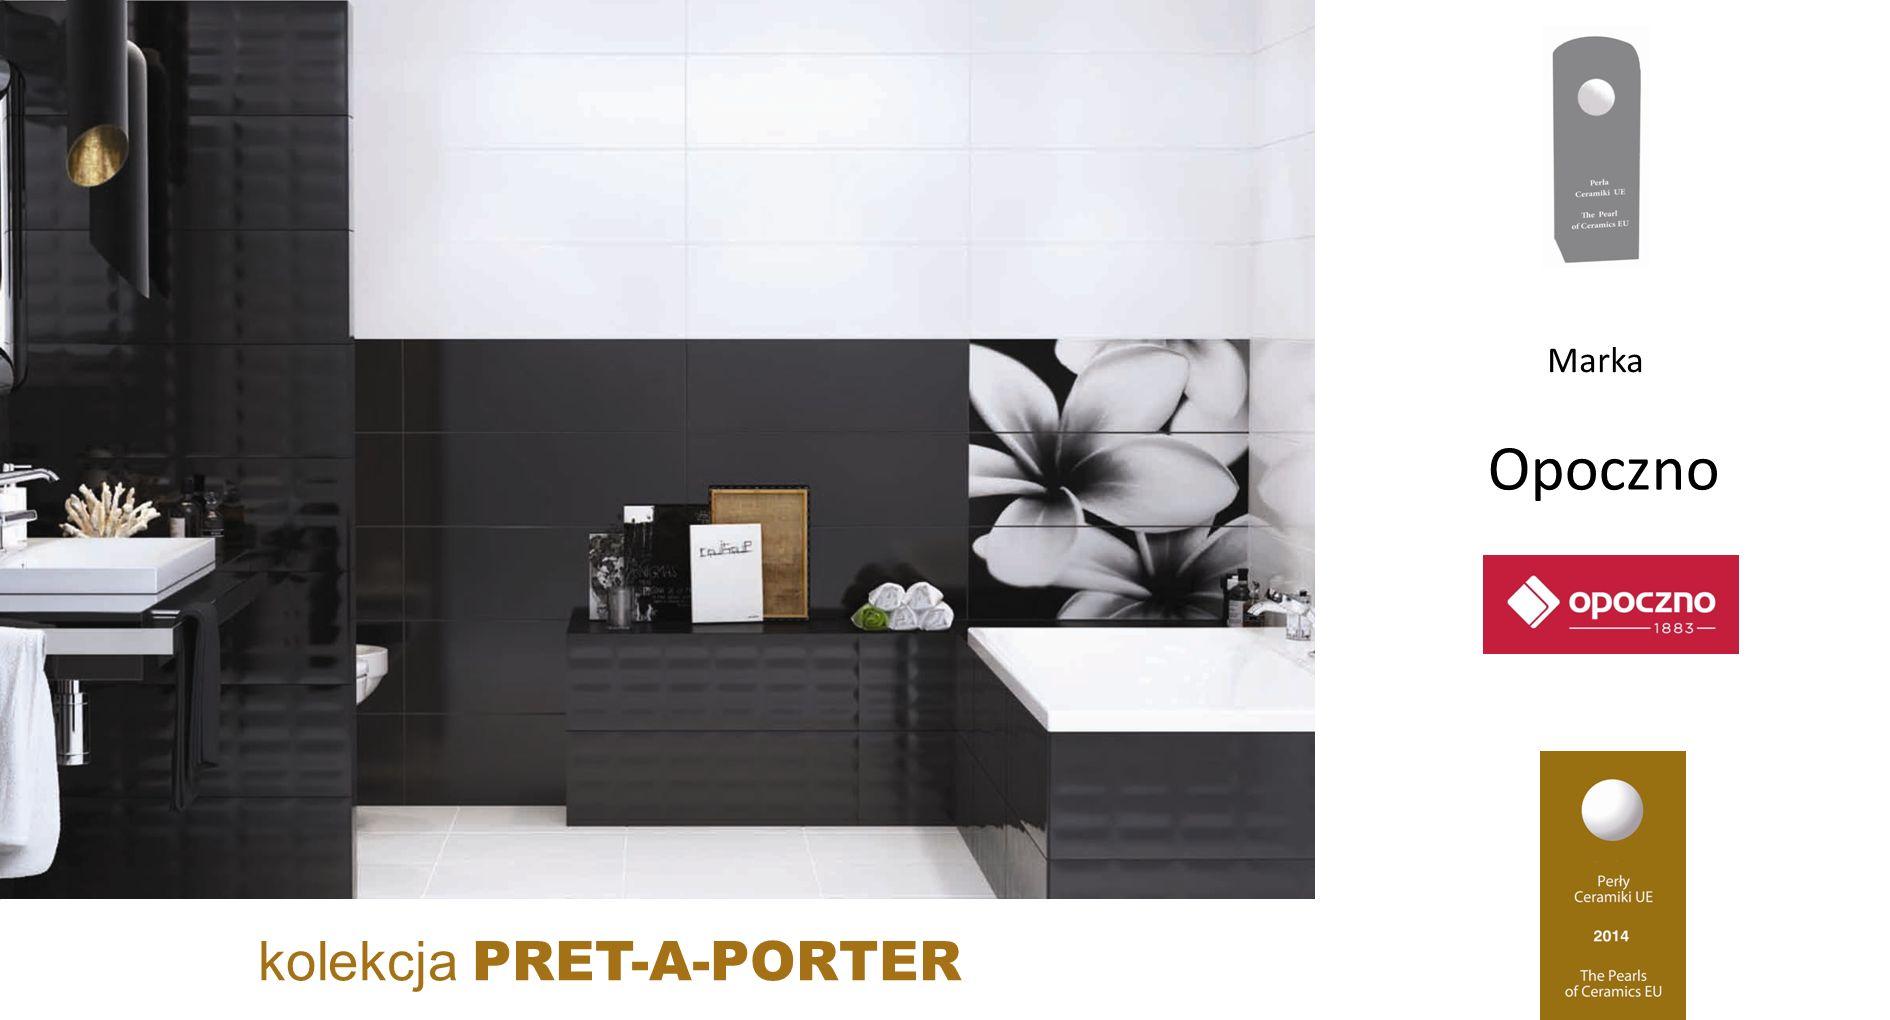 Opoczno kolekcja PRET-A-PORTER Marka